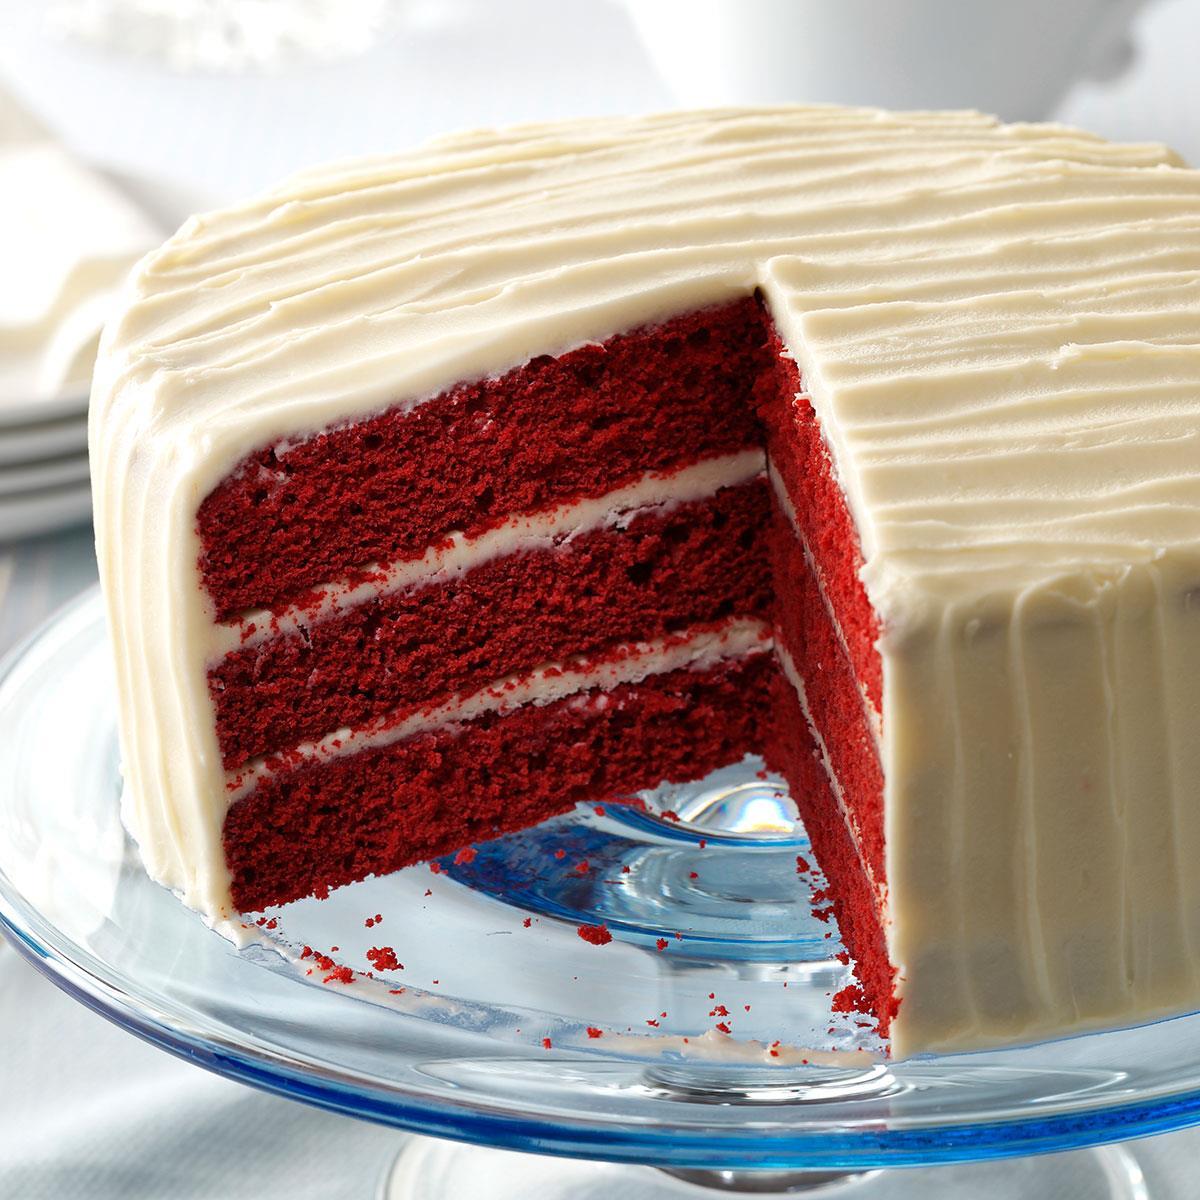 20 Receitas de Bolo Red Velvet para festas de aniversário, casamentos e sobremesas Caseiras fáceis de preparar